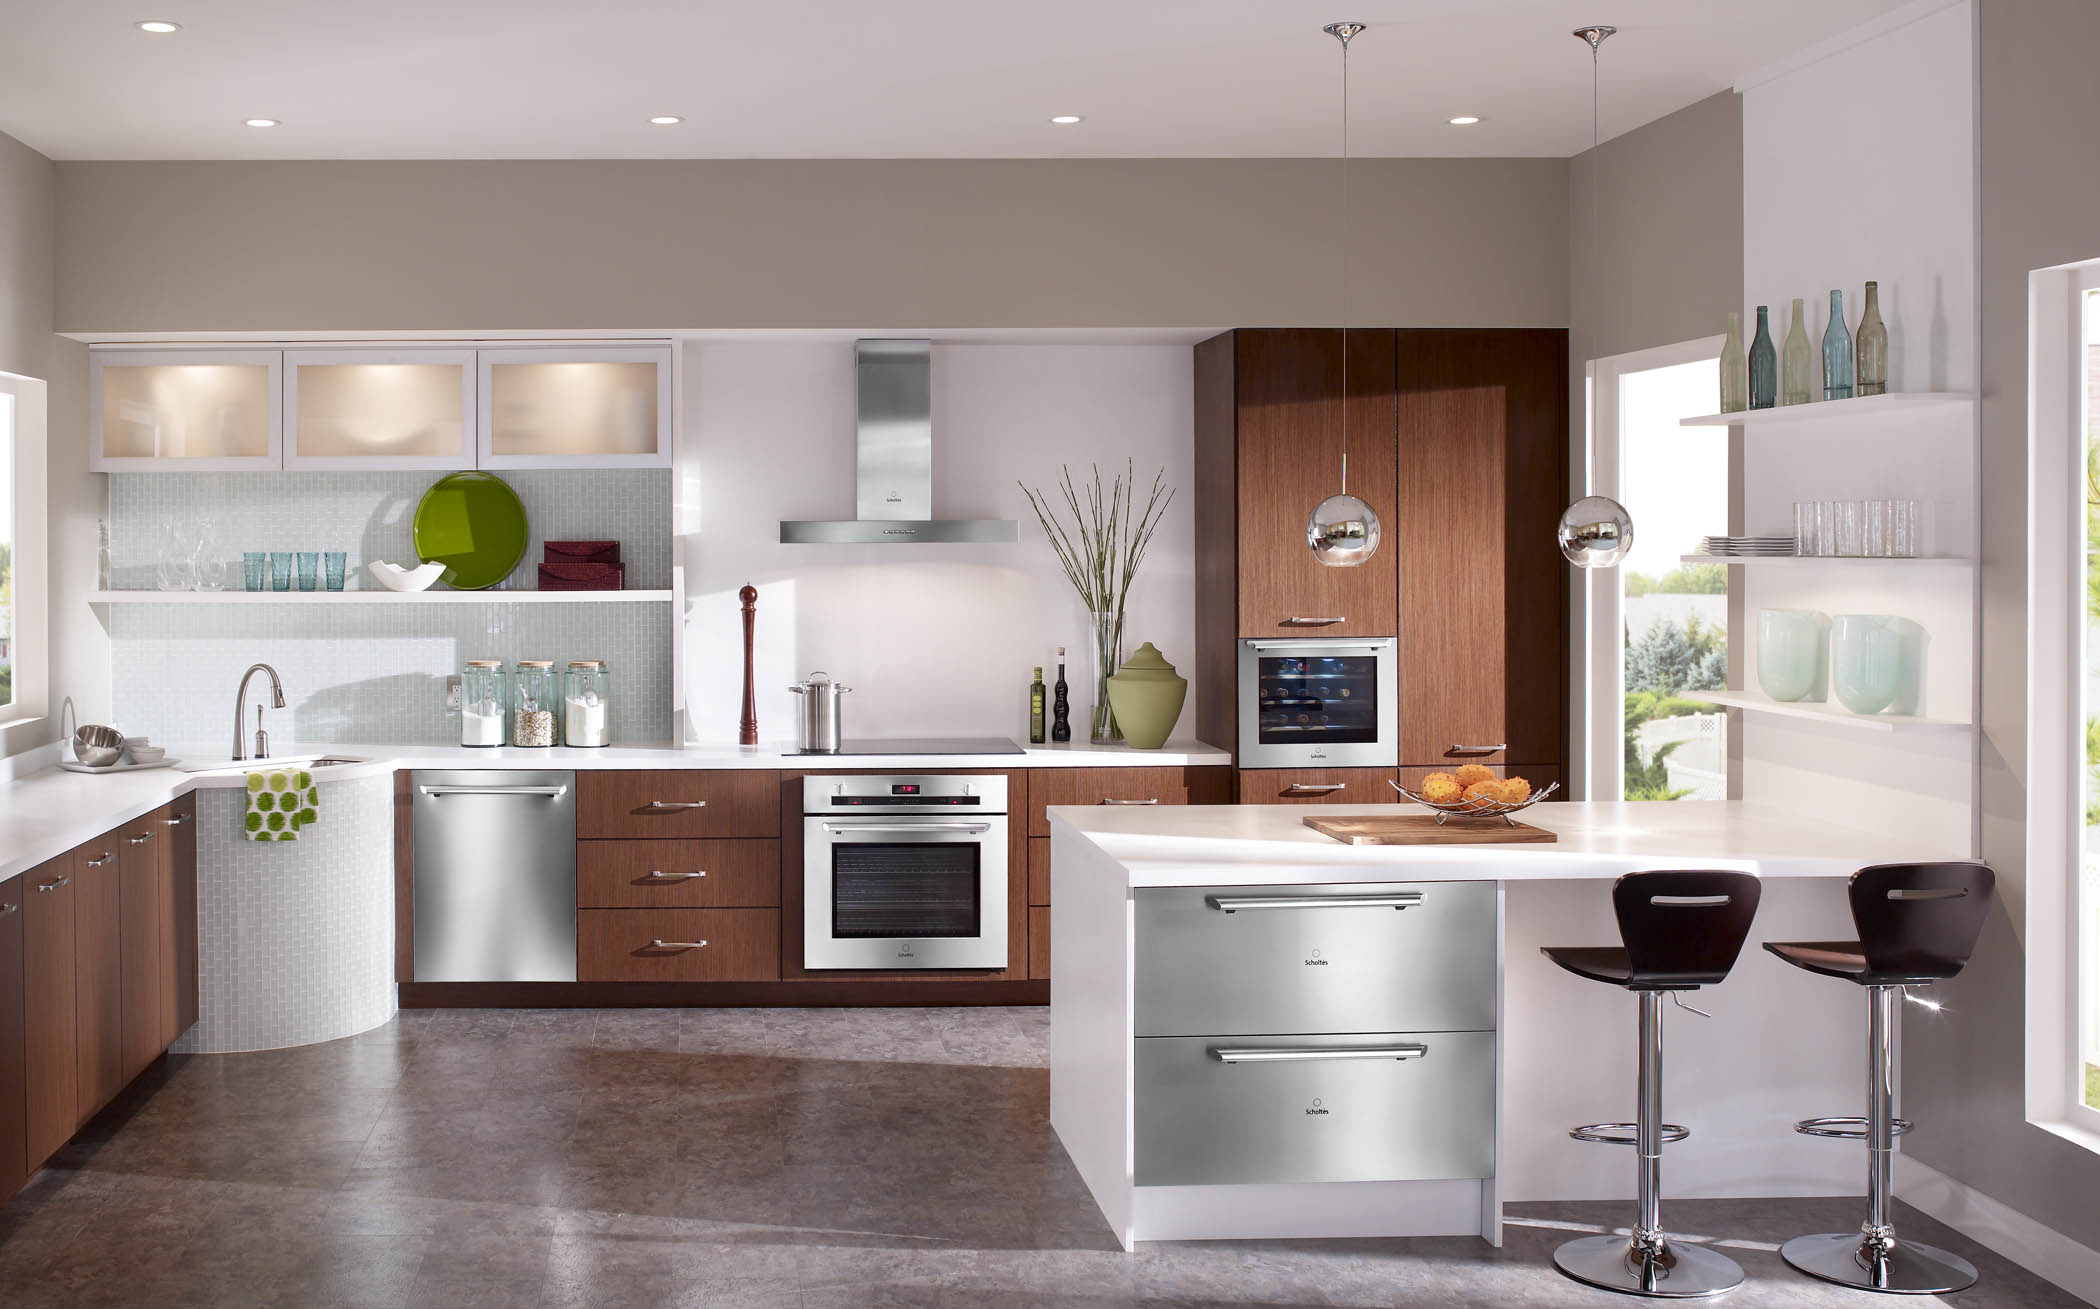 Uncategorized American Kitchen Appliances appliances launch across north america